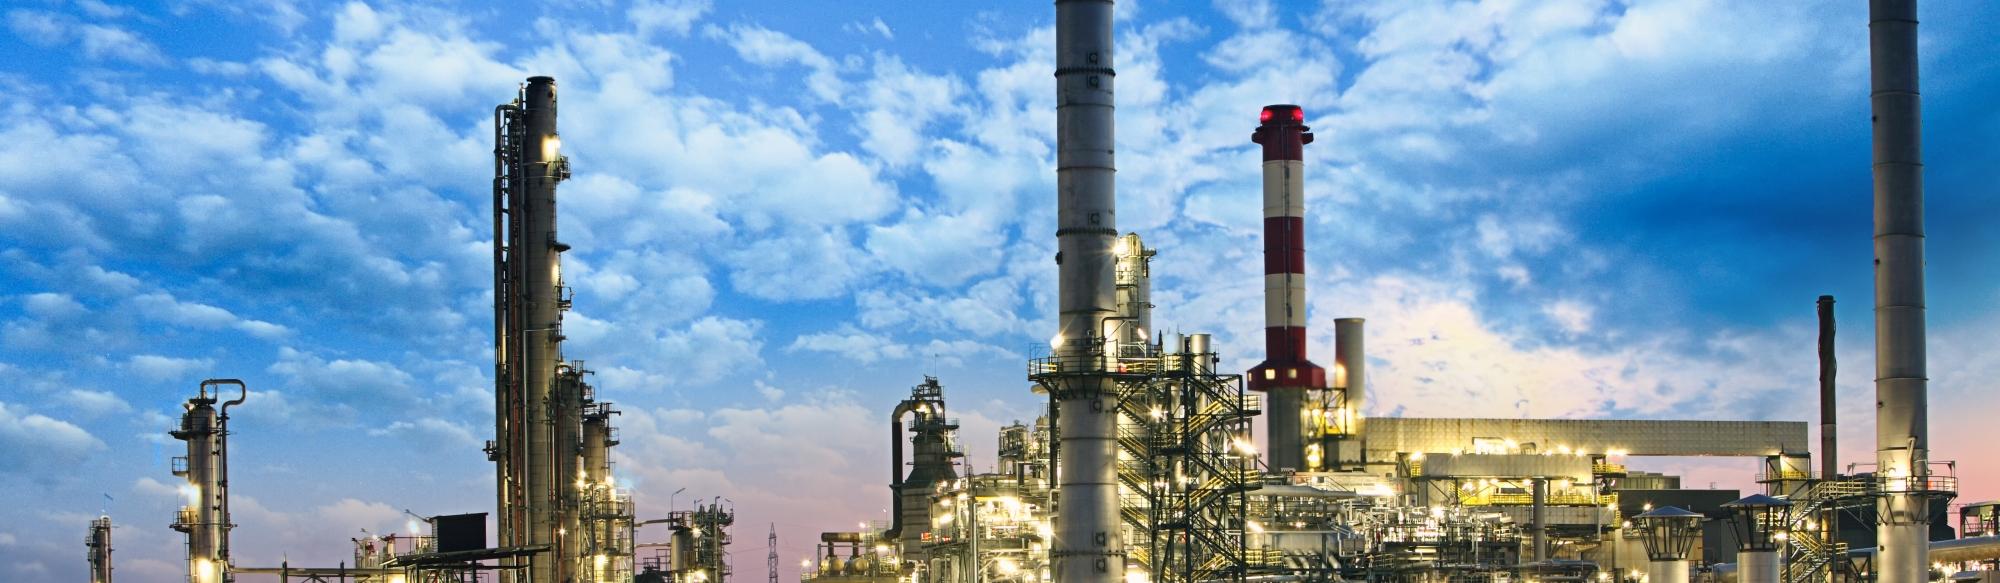 Power Plants Plant Equipment Layout